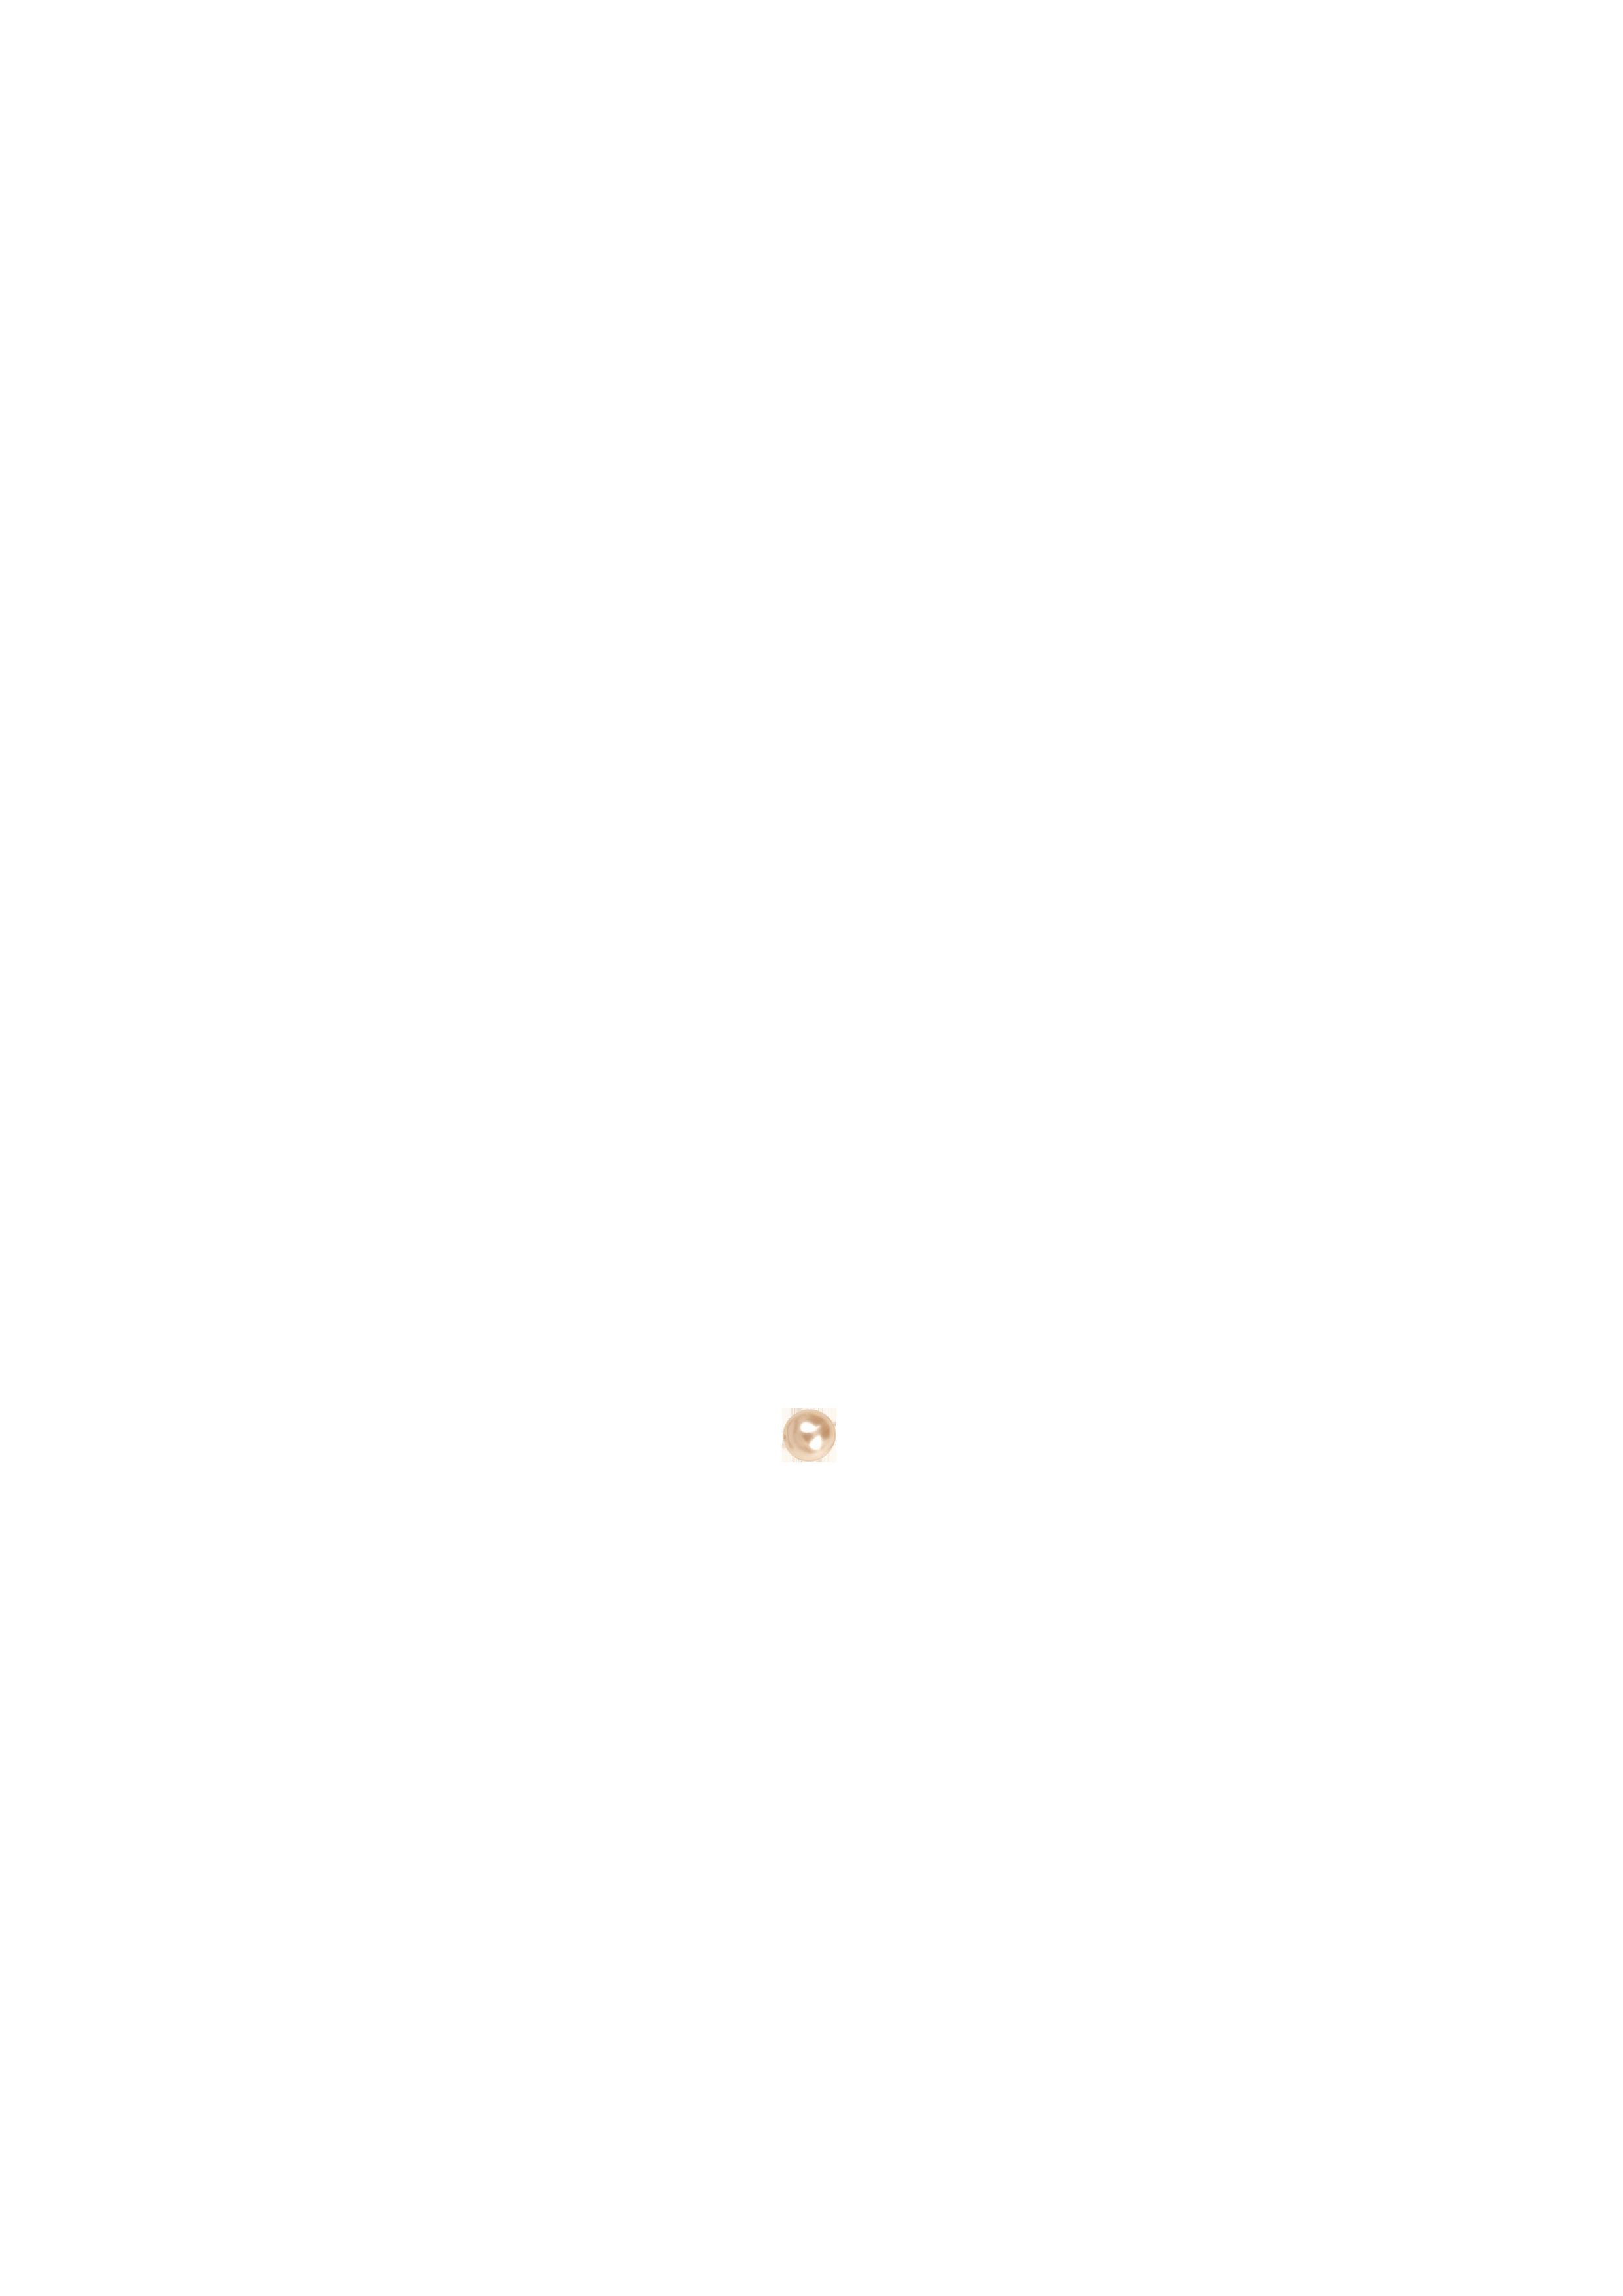 Perle 8mm Swarovski nacrée rose poudré